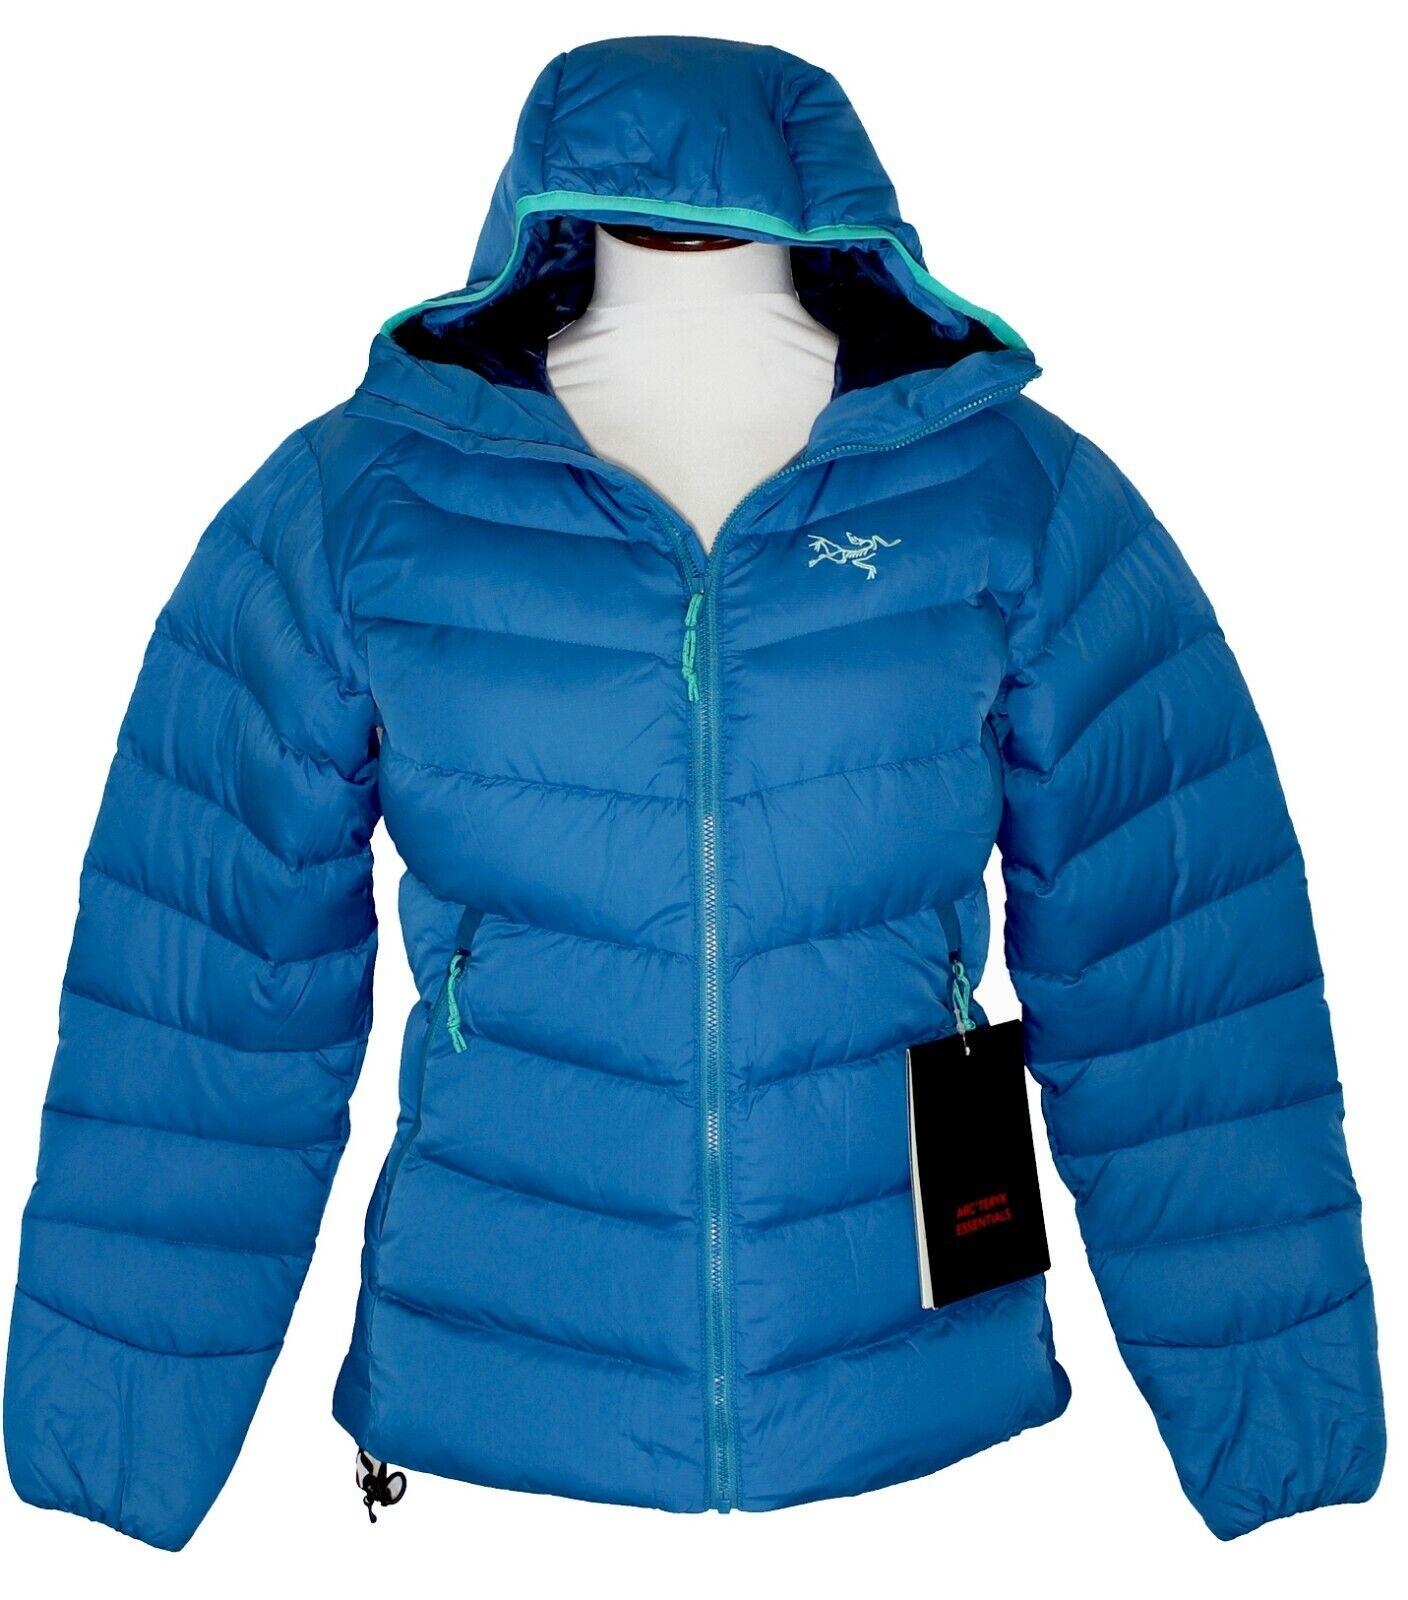 Arc'teryx Thorium SV Down Hoodie NEW damen sz XL Cyan Blau Jacket